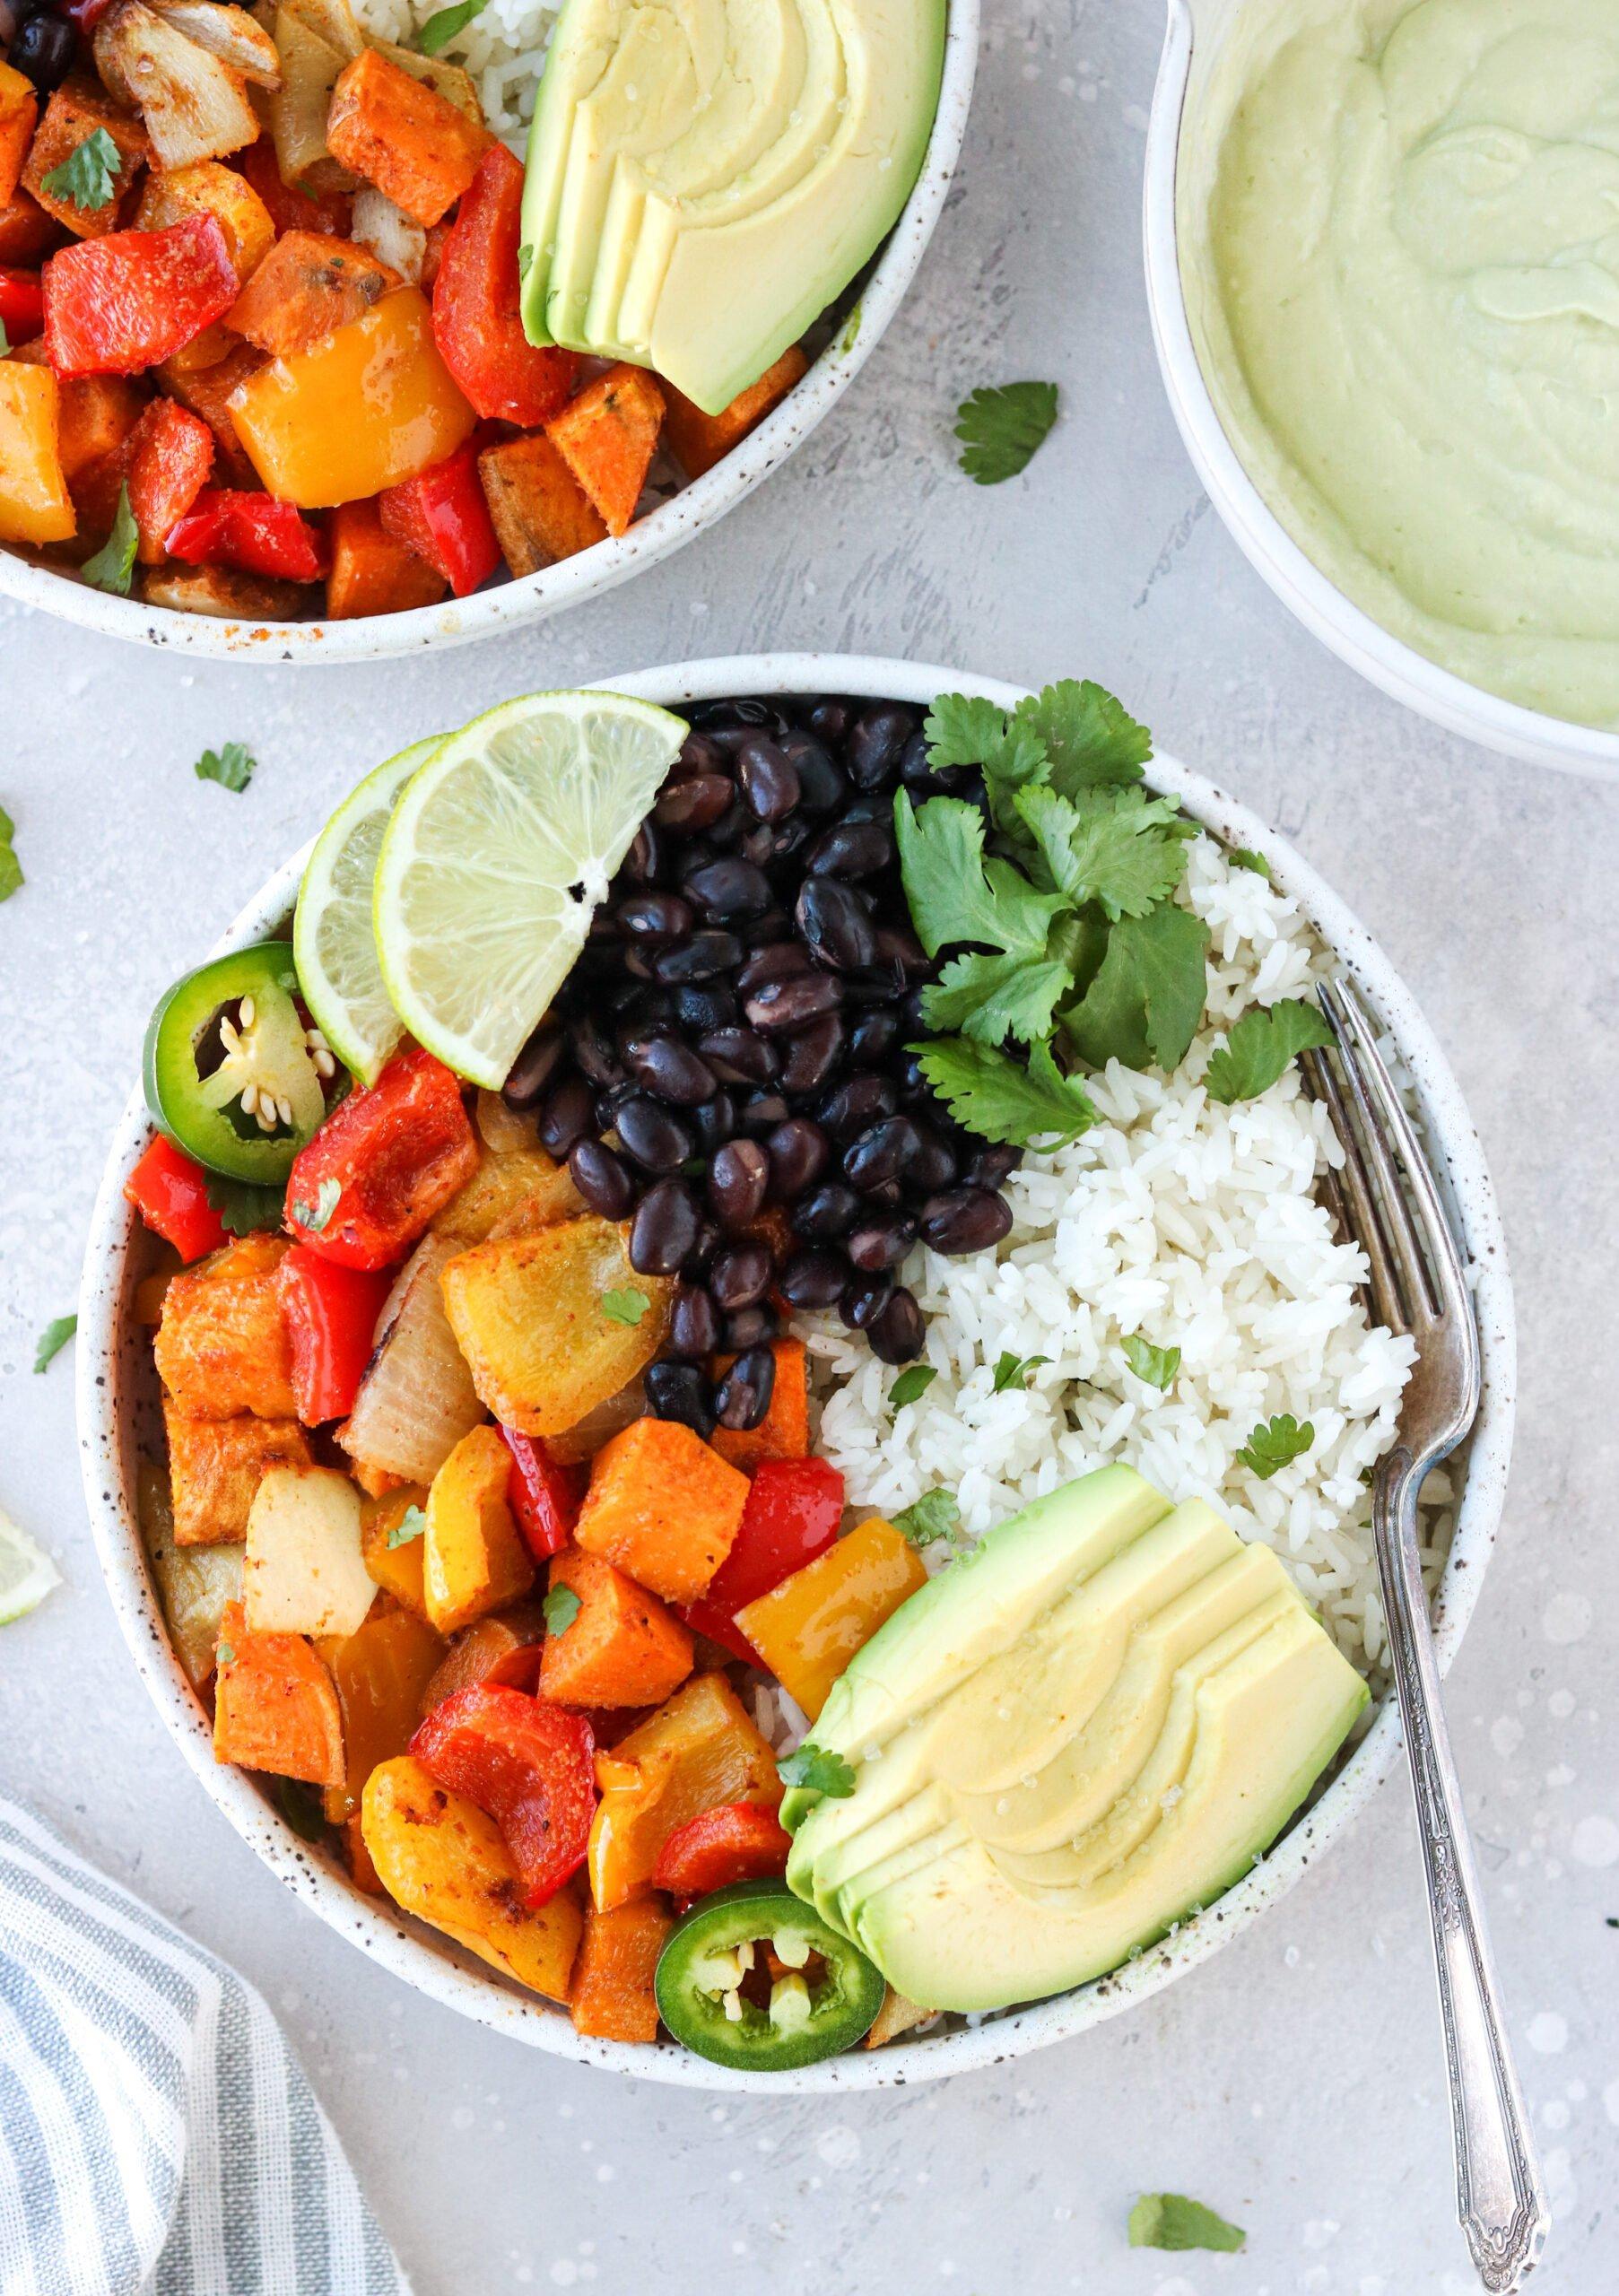 roasted veggie burrito bowls with avocado Crema